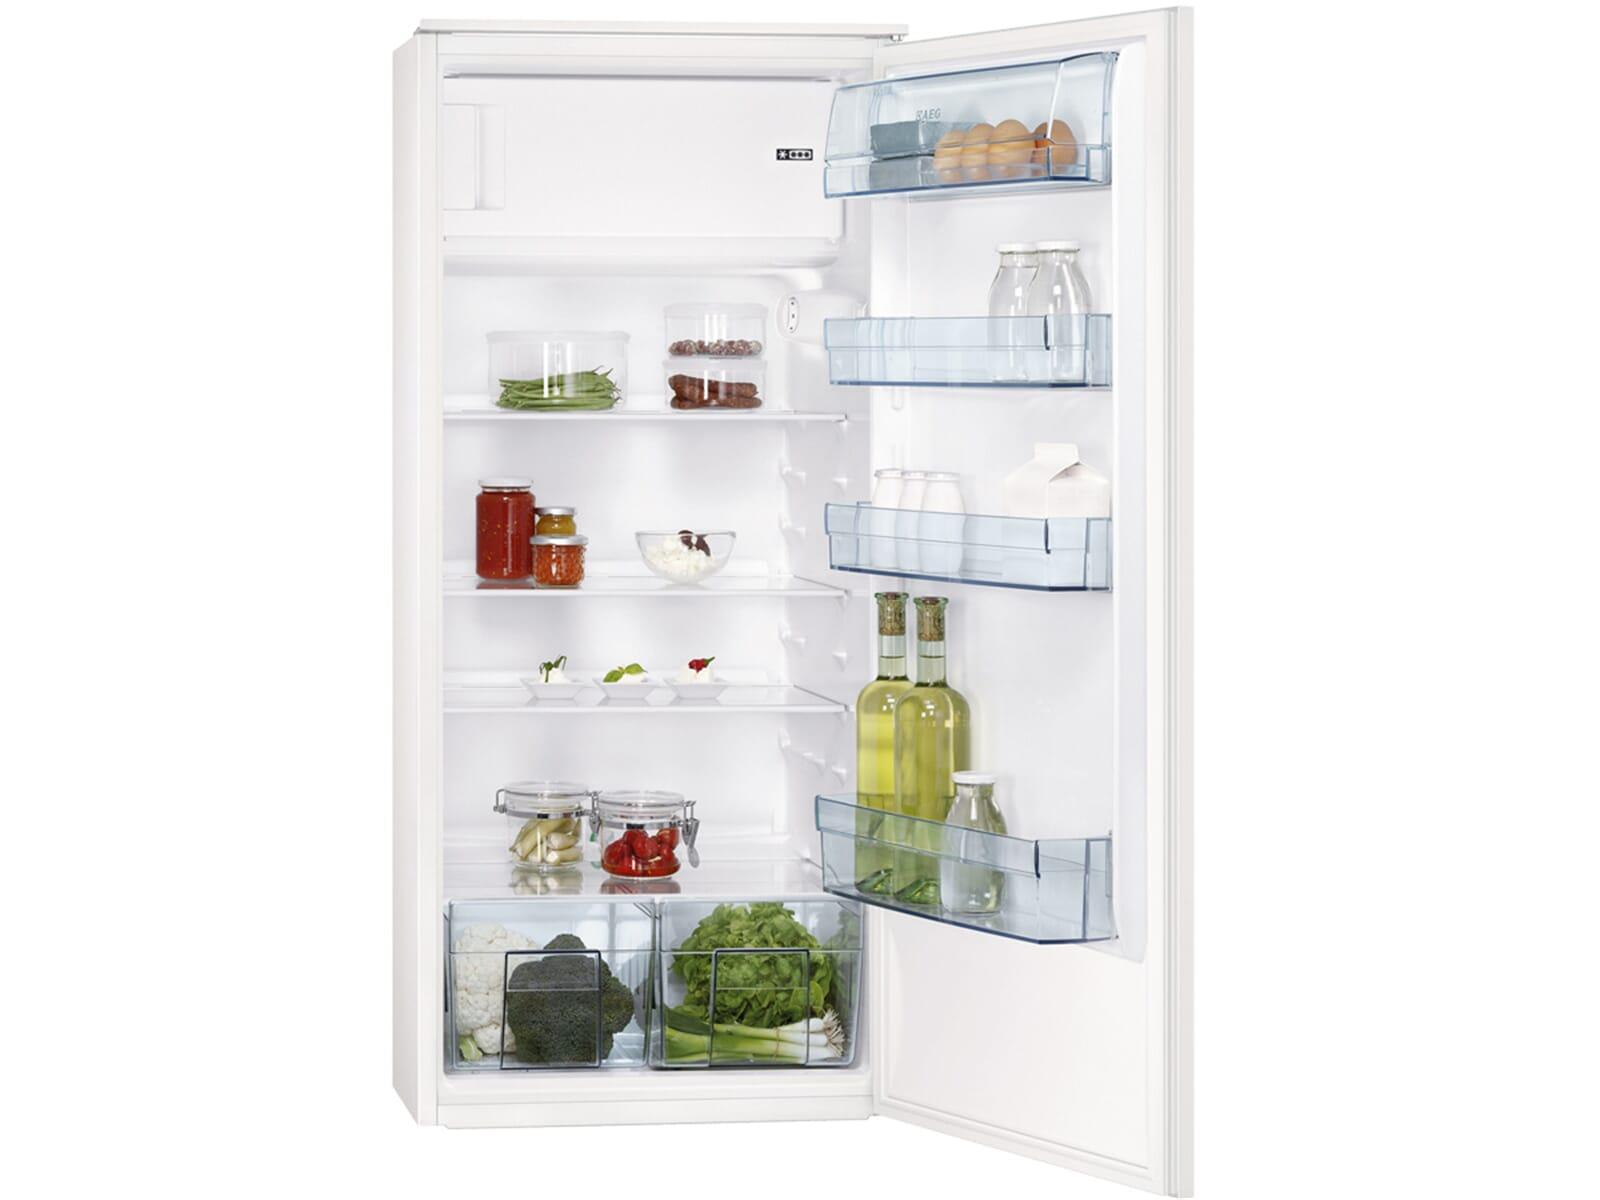 Aeg Kühlschrank Einbau : Schlepptür kühlschrank aeg sks s einbau kühlschrank